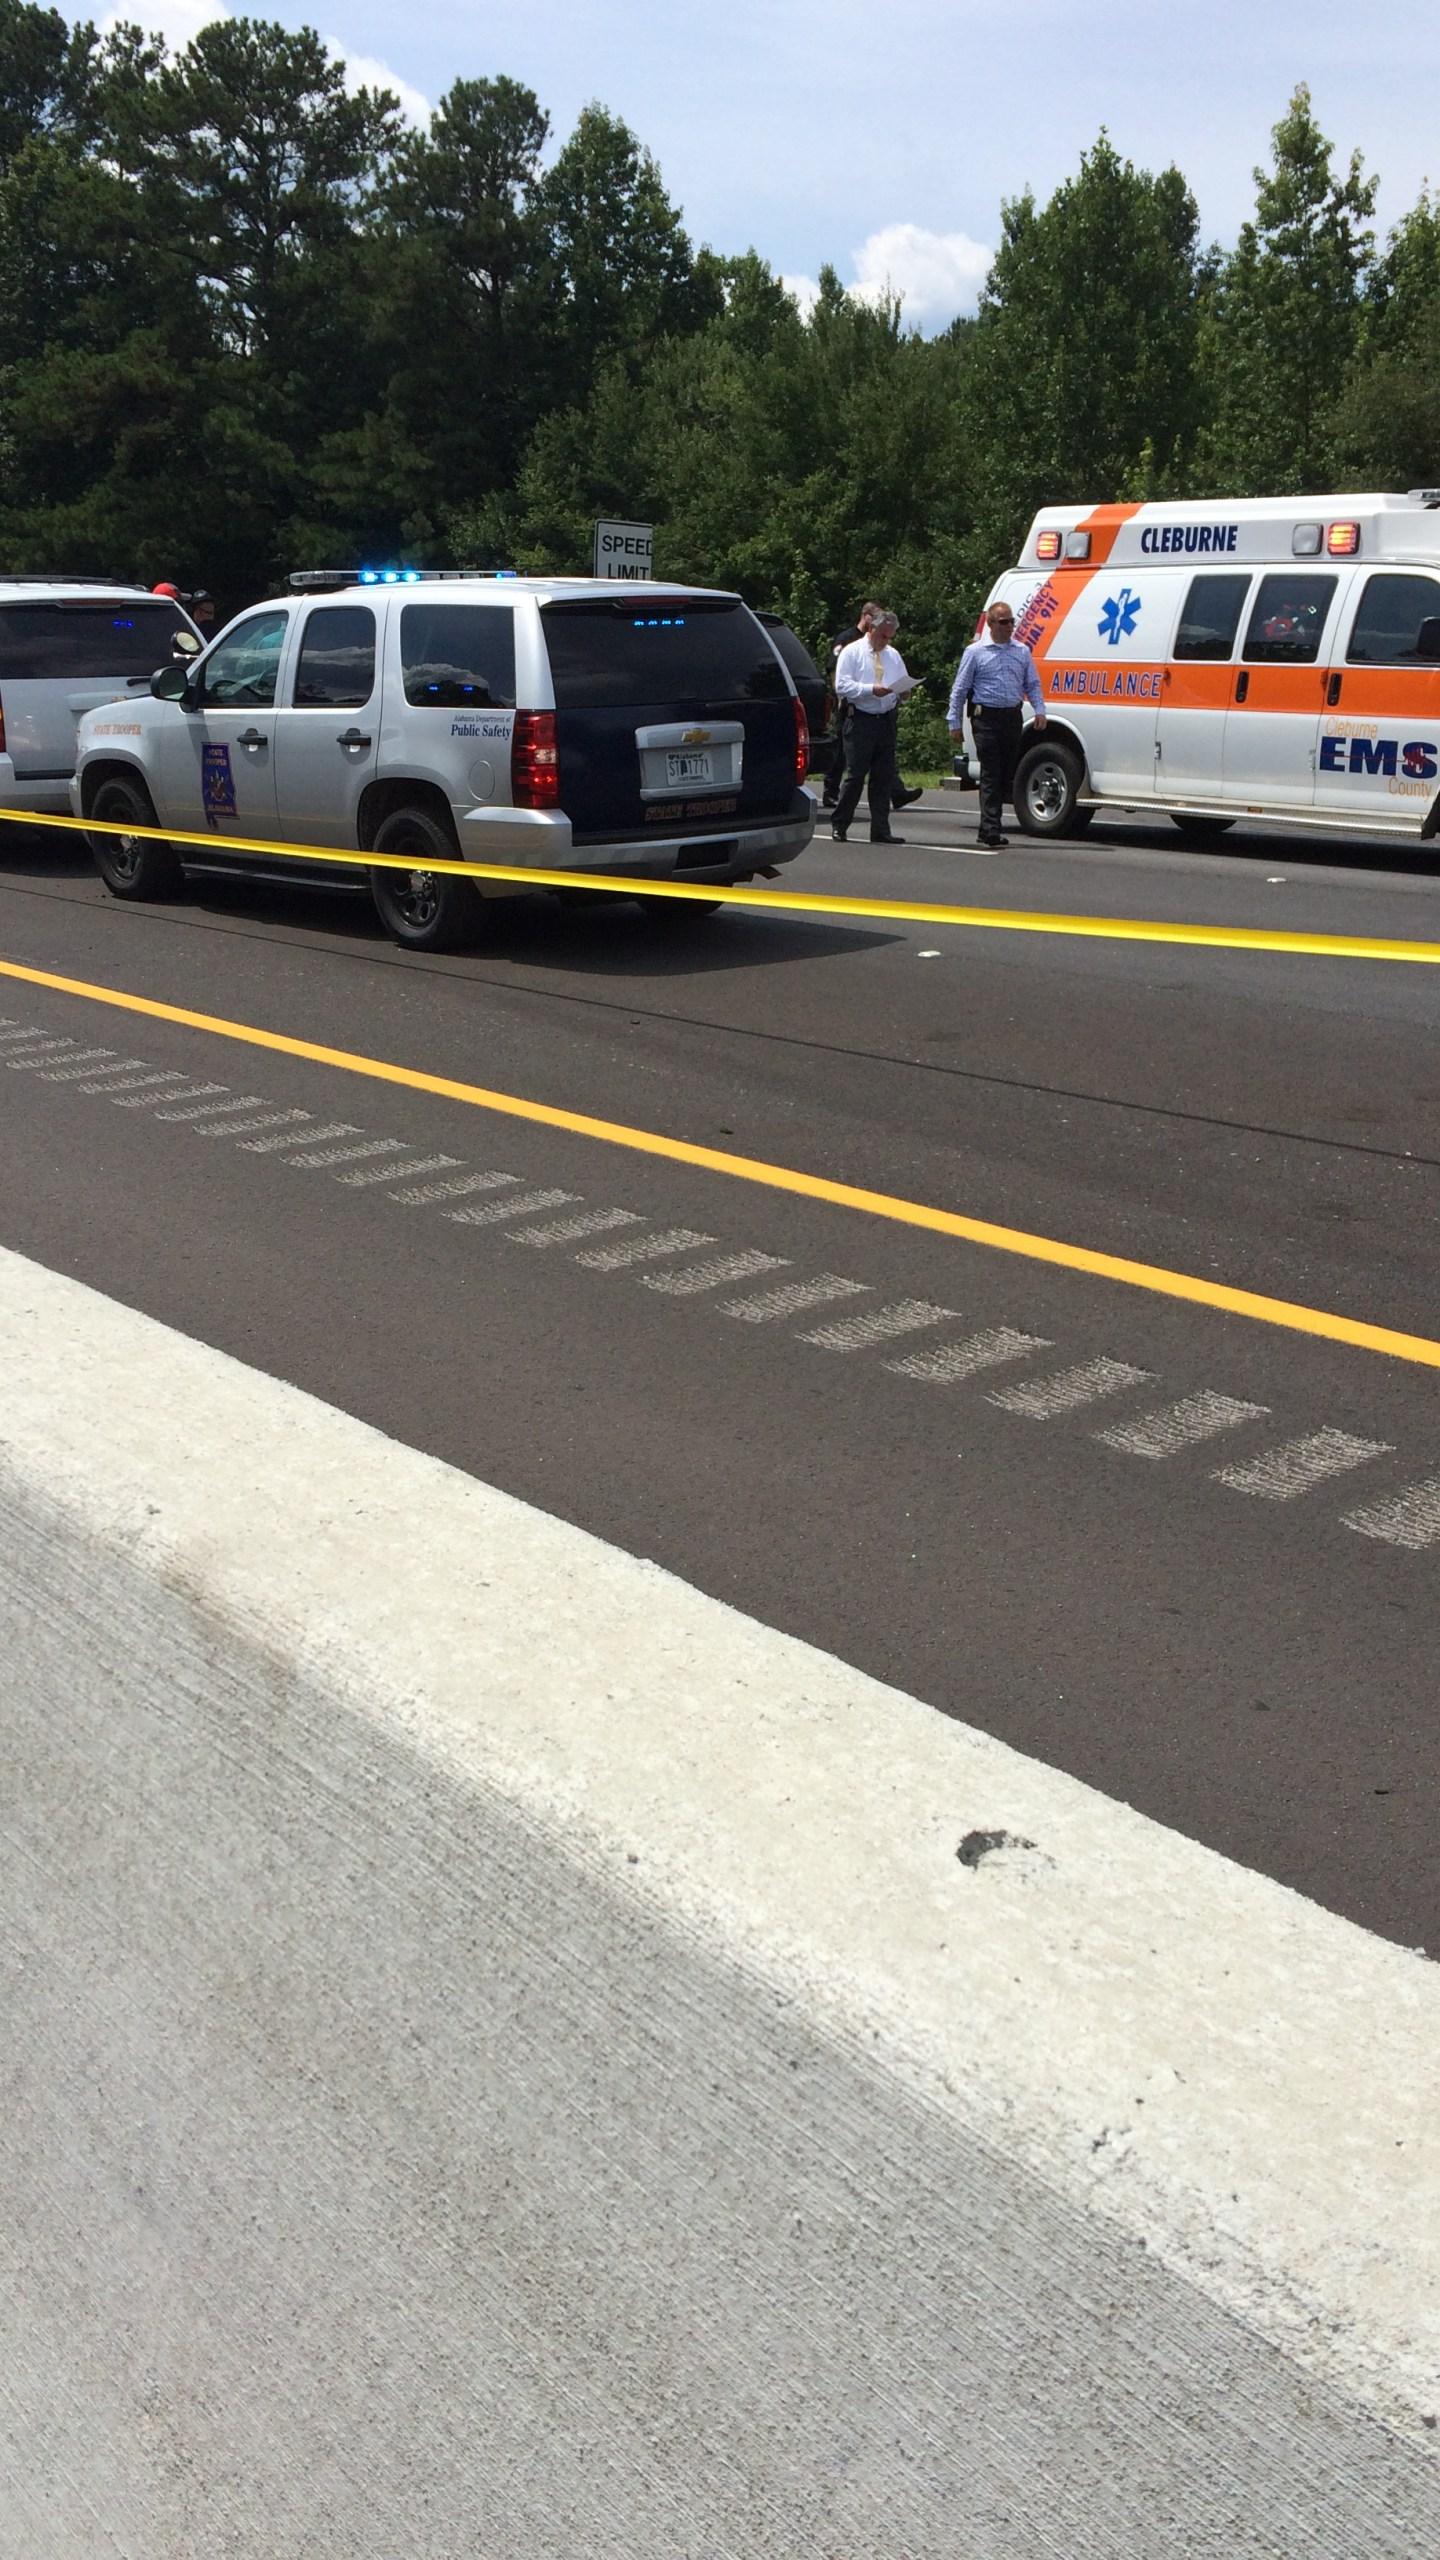 murder-suicide car scene ALabama Cleburne County 1-20 Georgia_107590